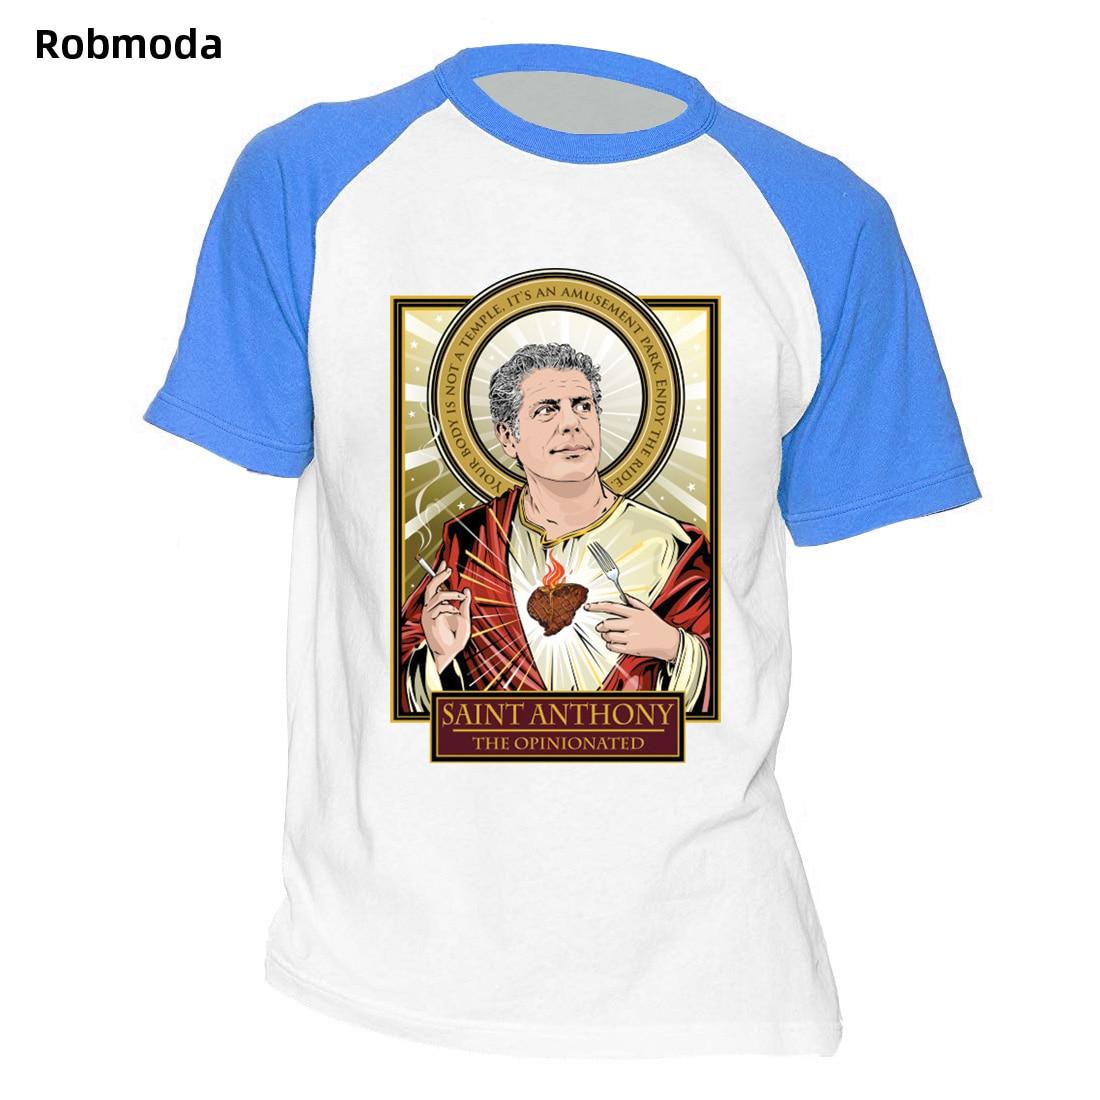 Saint mia Jesus 2019 New man 39 s Fashion Raglan T shirt Harajuku Print Short Sleeve O neck Top Shirt Van Gogh Art Tees For male in T Shirts from Men 39 s Clothing